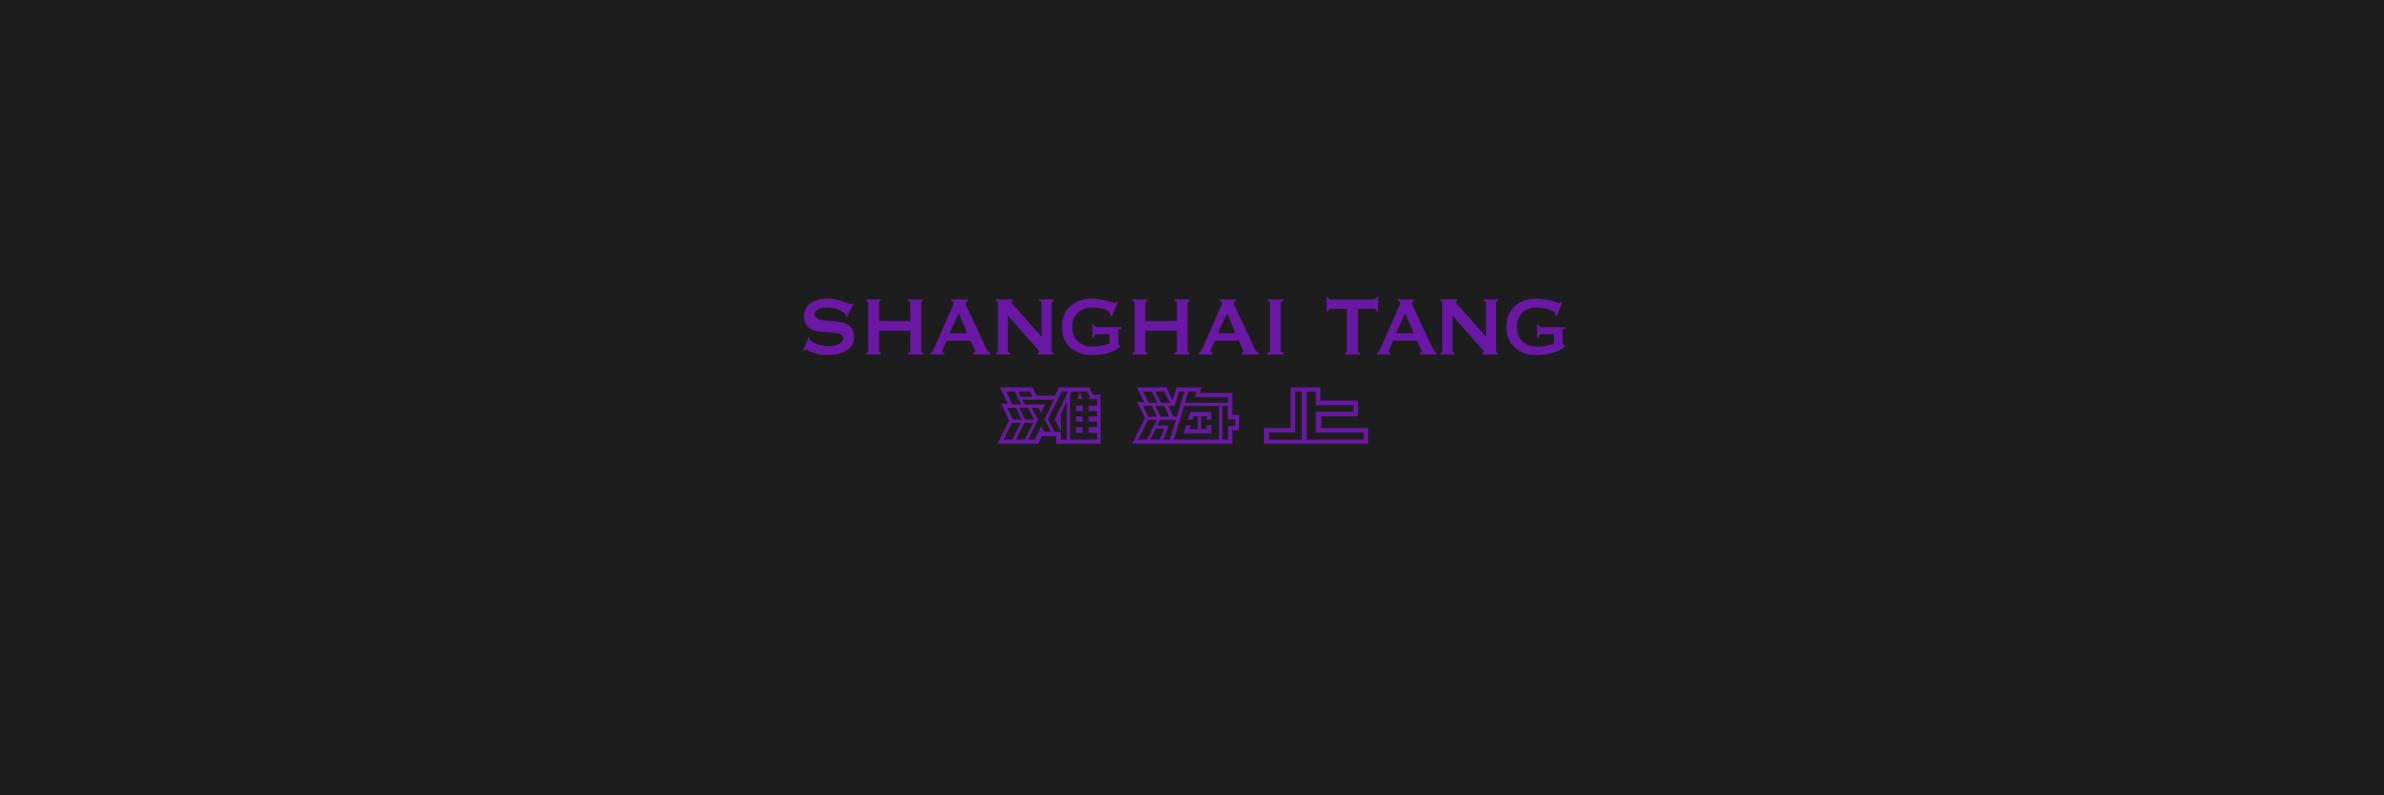 ST black logo